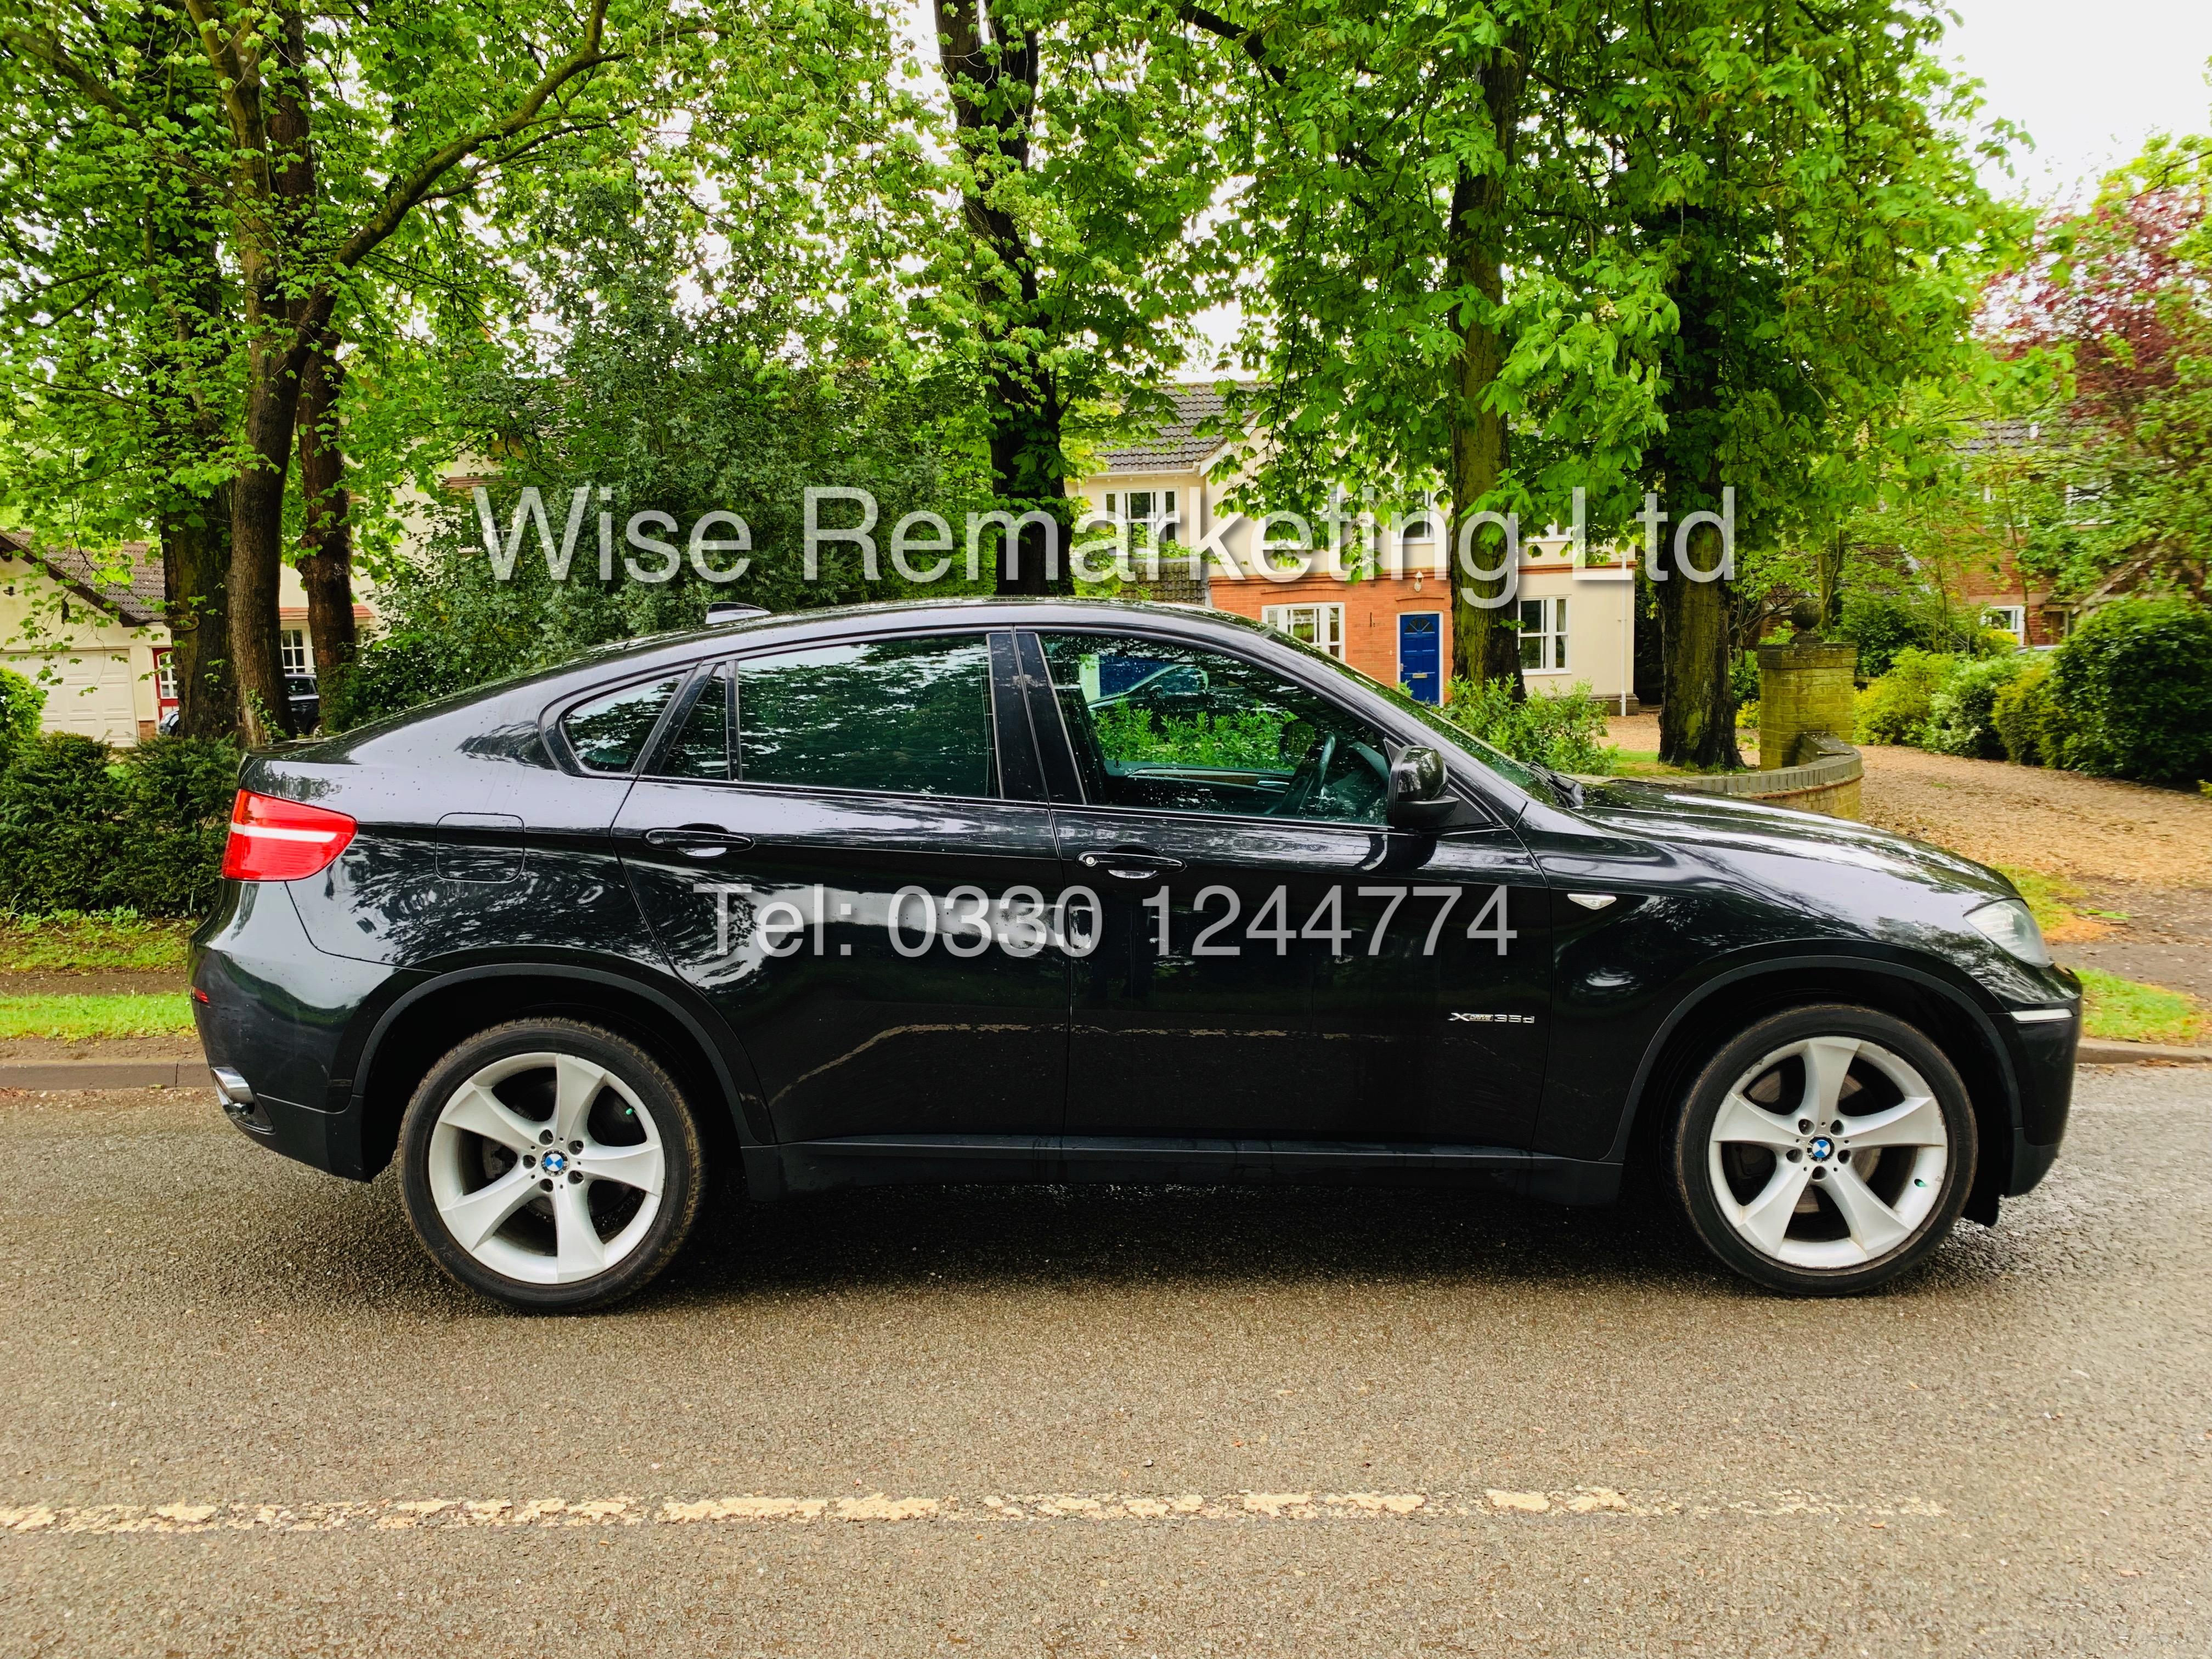 BMW X6 XDRIVE 35D AUTO (2009 SPEC) *1 PREVIOUS OWNER* PARKING AID - SAT NAV - FSH - Image 6 of 25